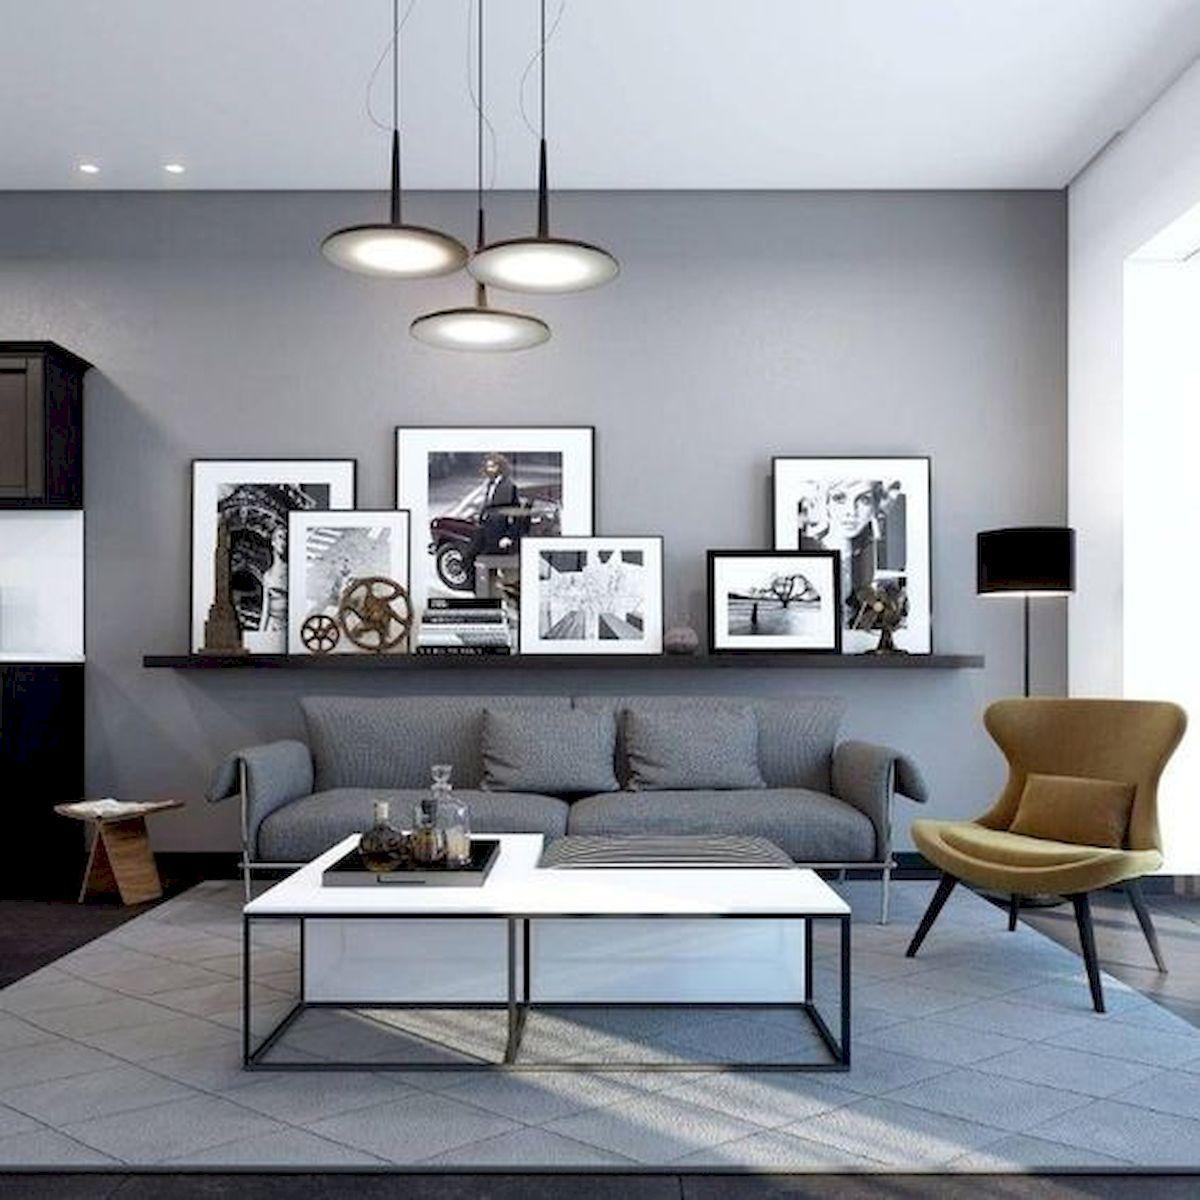 60 amazing wall decor and design ideas with modern stylish